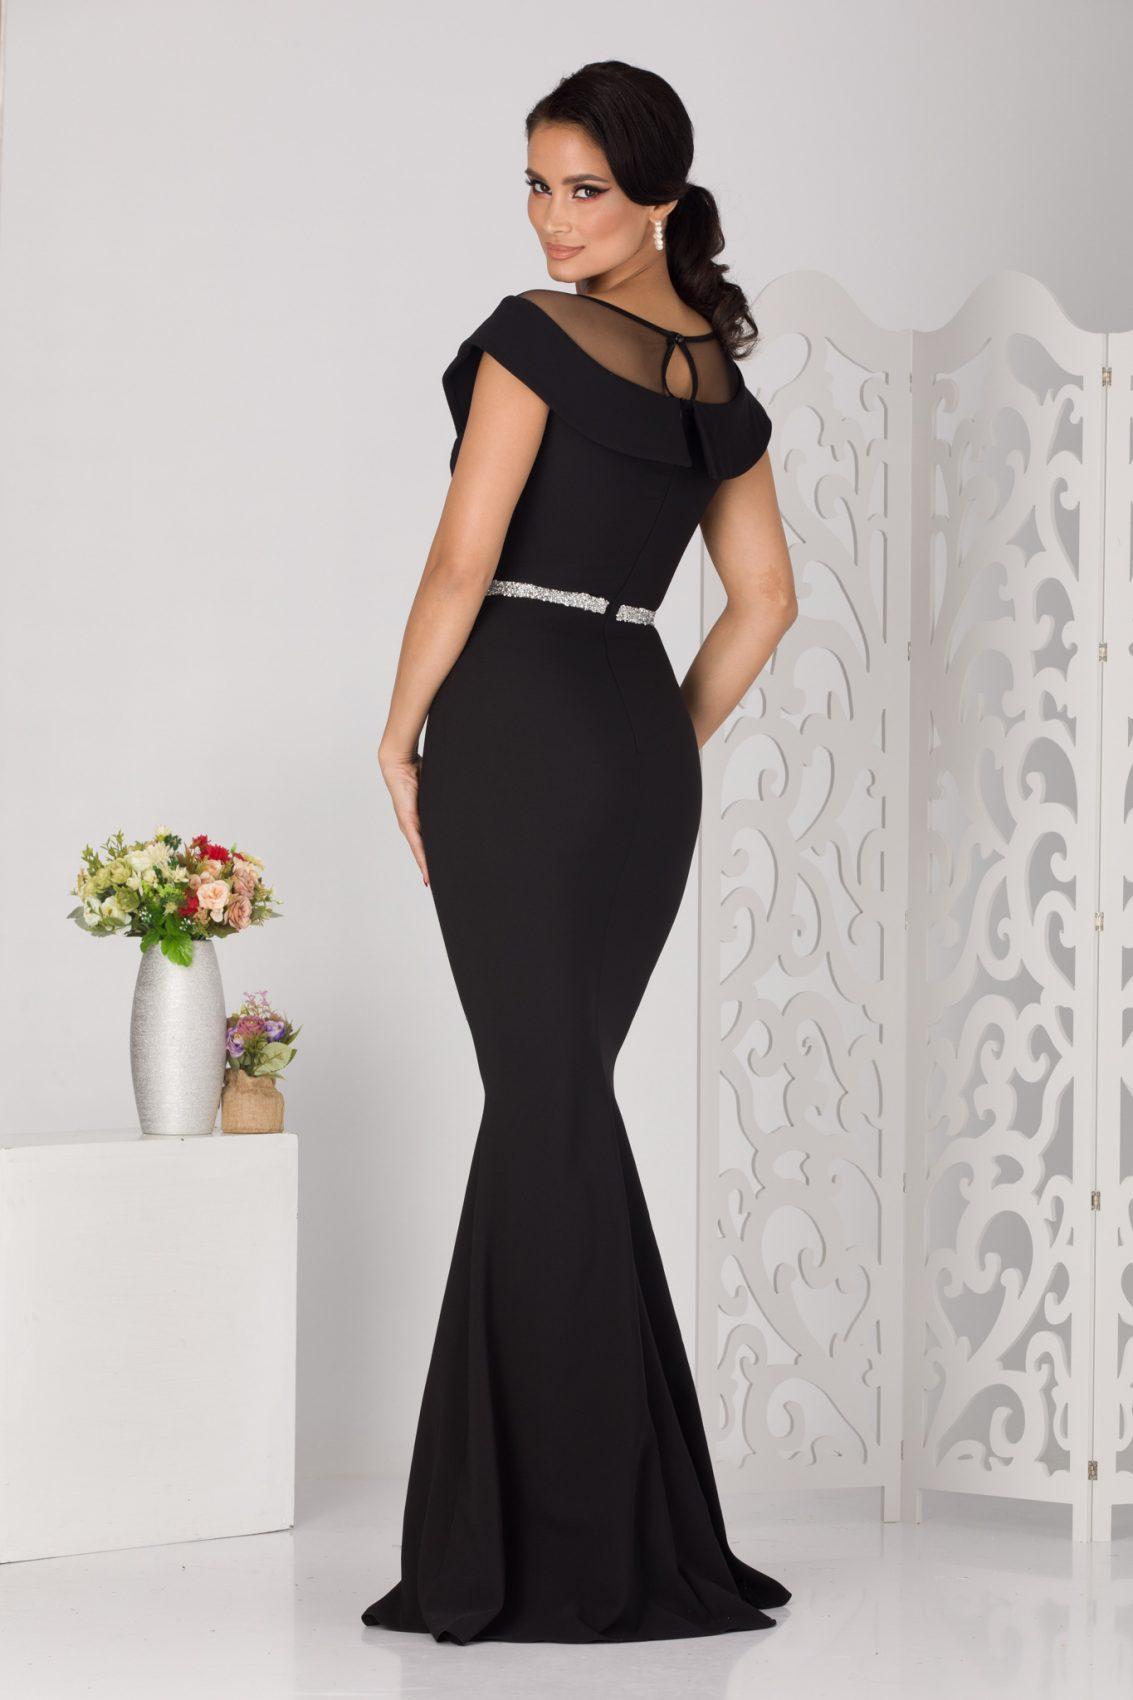 Vibrating Maxi Μαύρο Φόρεμα 5132